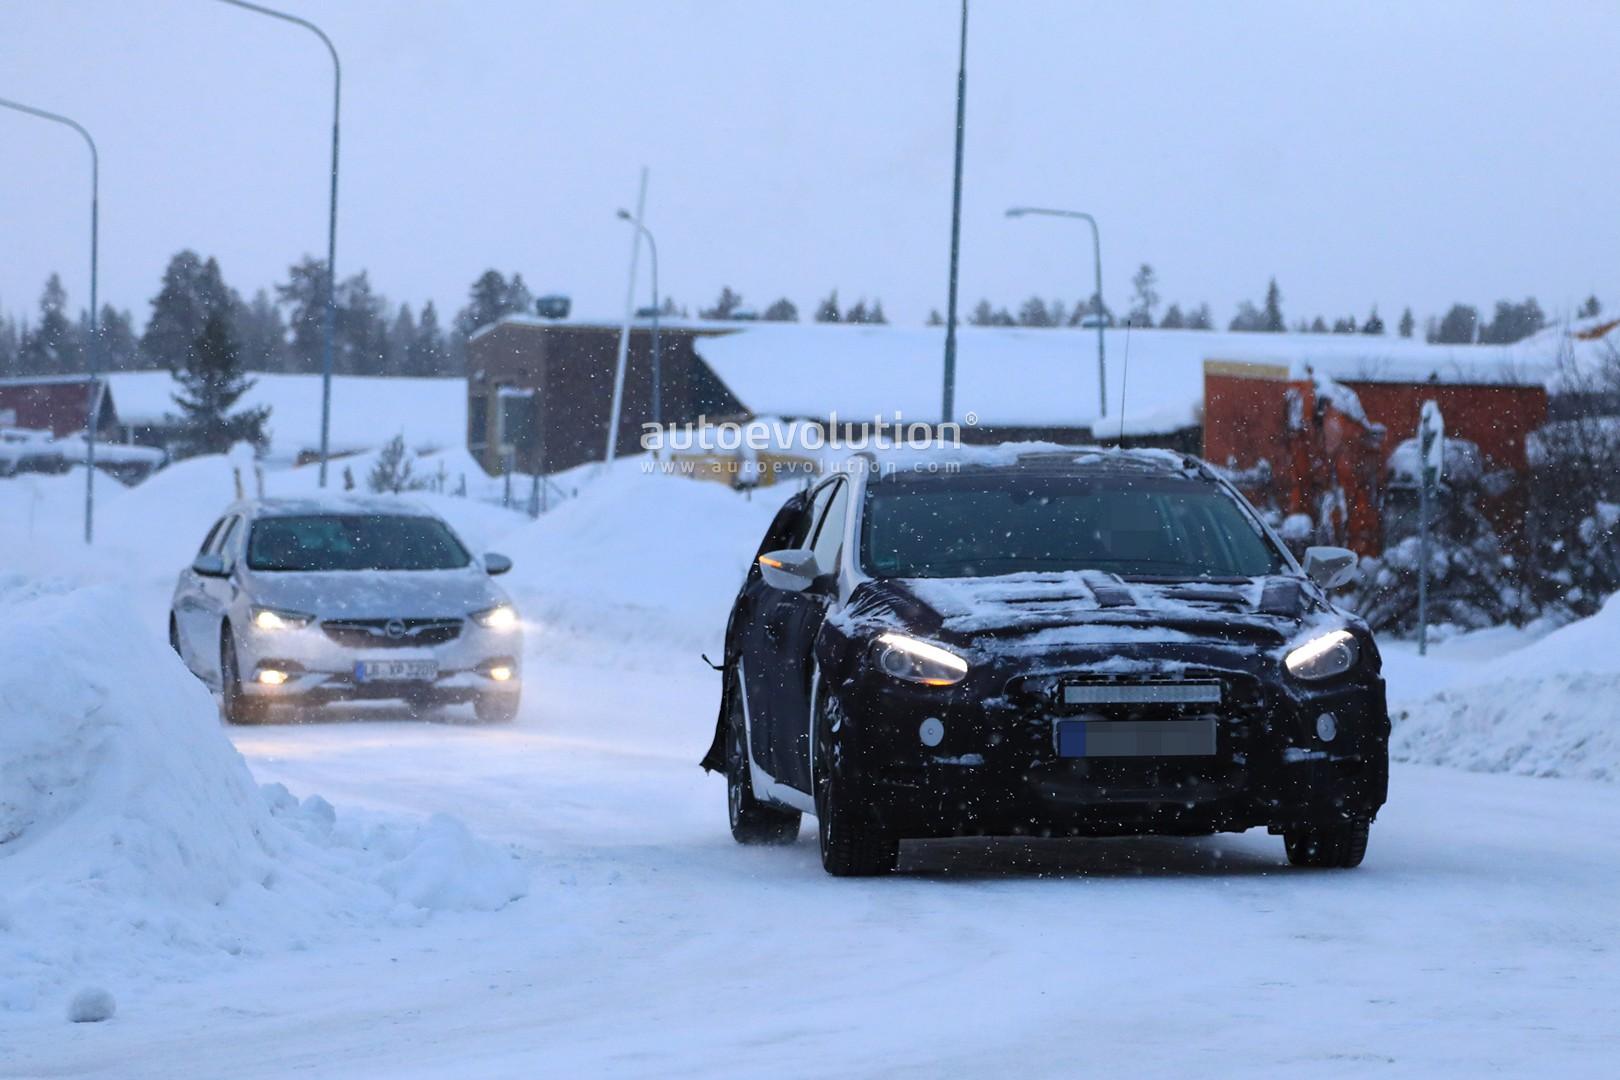 2019 Hyundai I40 Wagon Spied Winter Benchmark Testing With